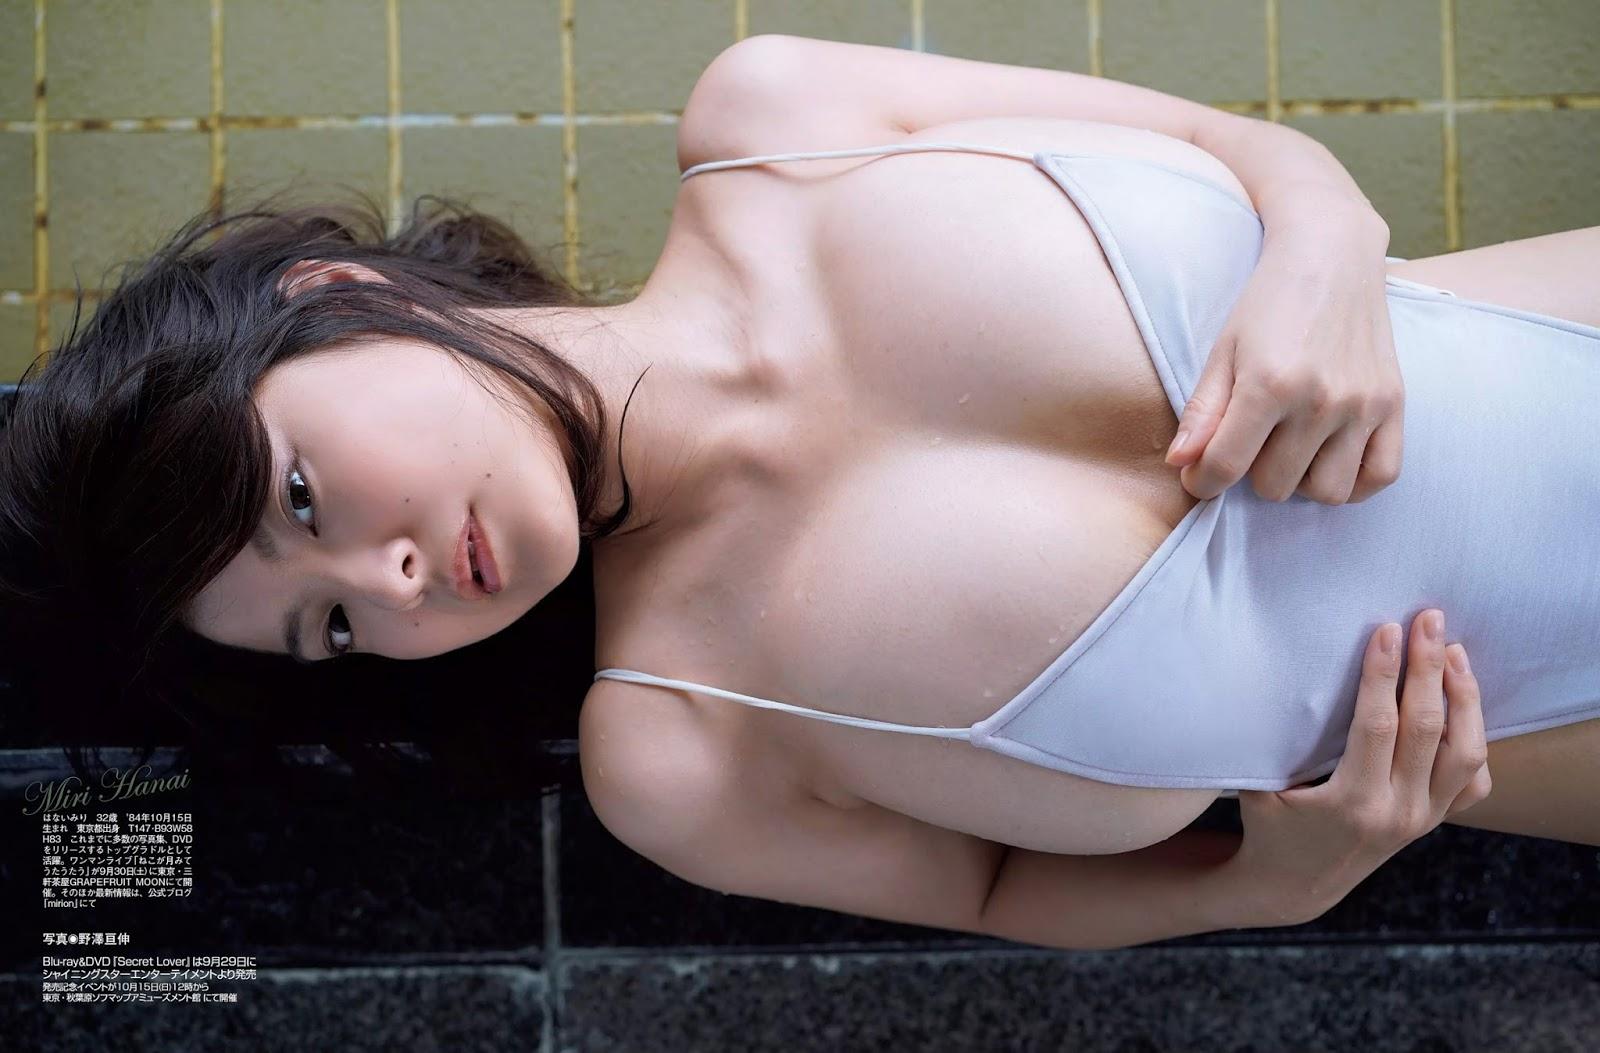 Miri Hanai 花井美理, FLASH 電子版 2017.09.26 (フラッシュ 2017年09月26日号)